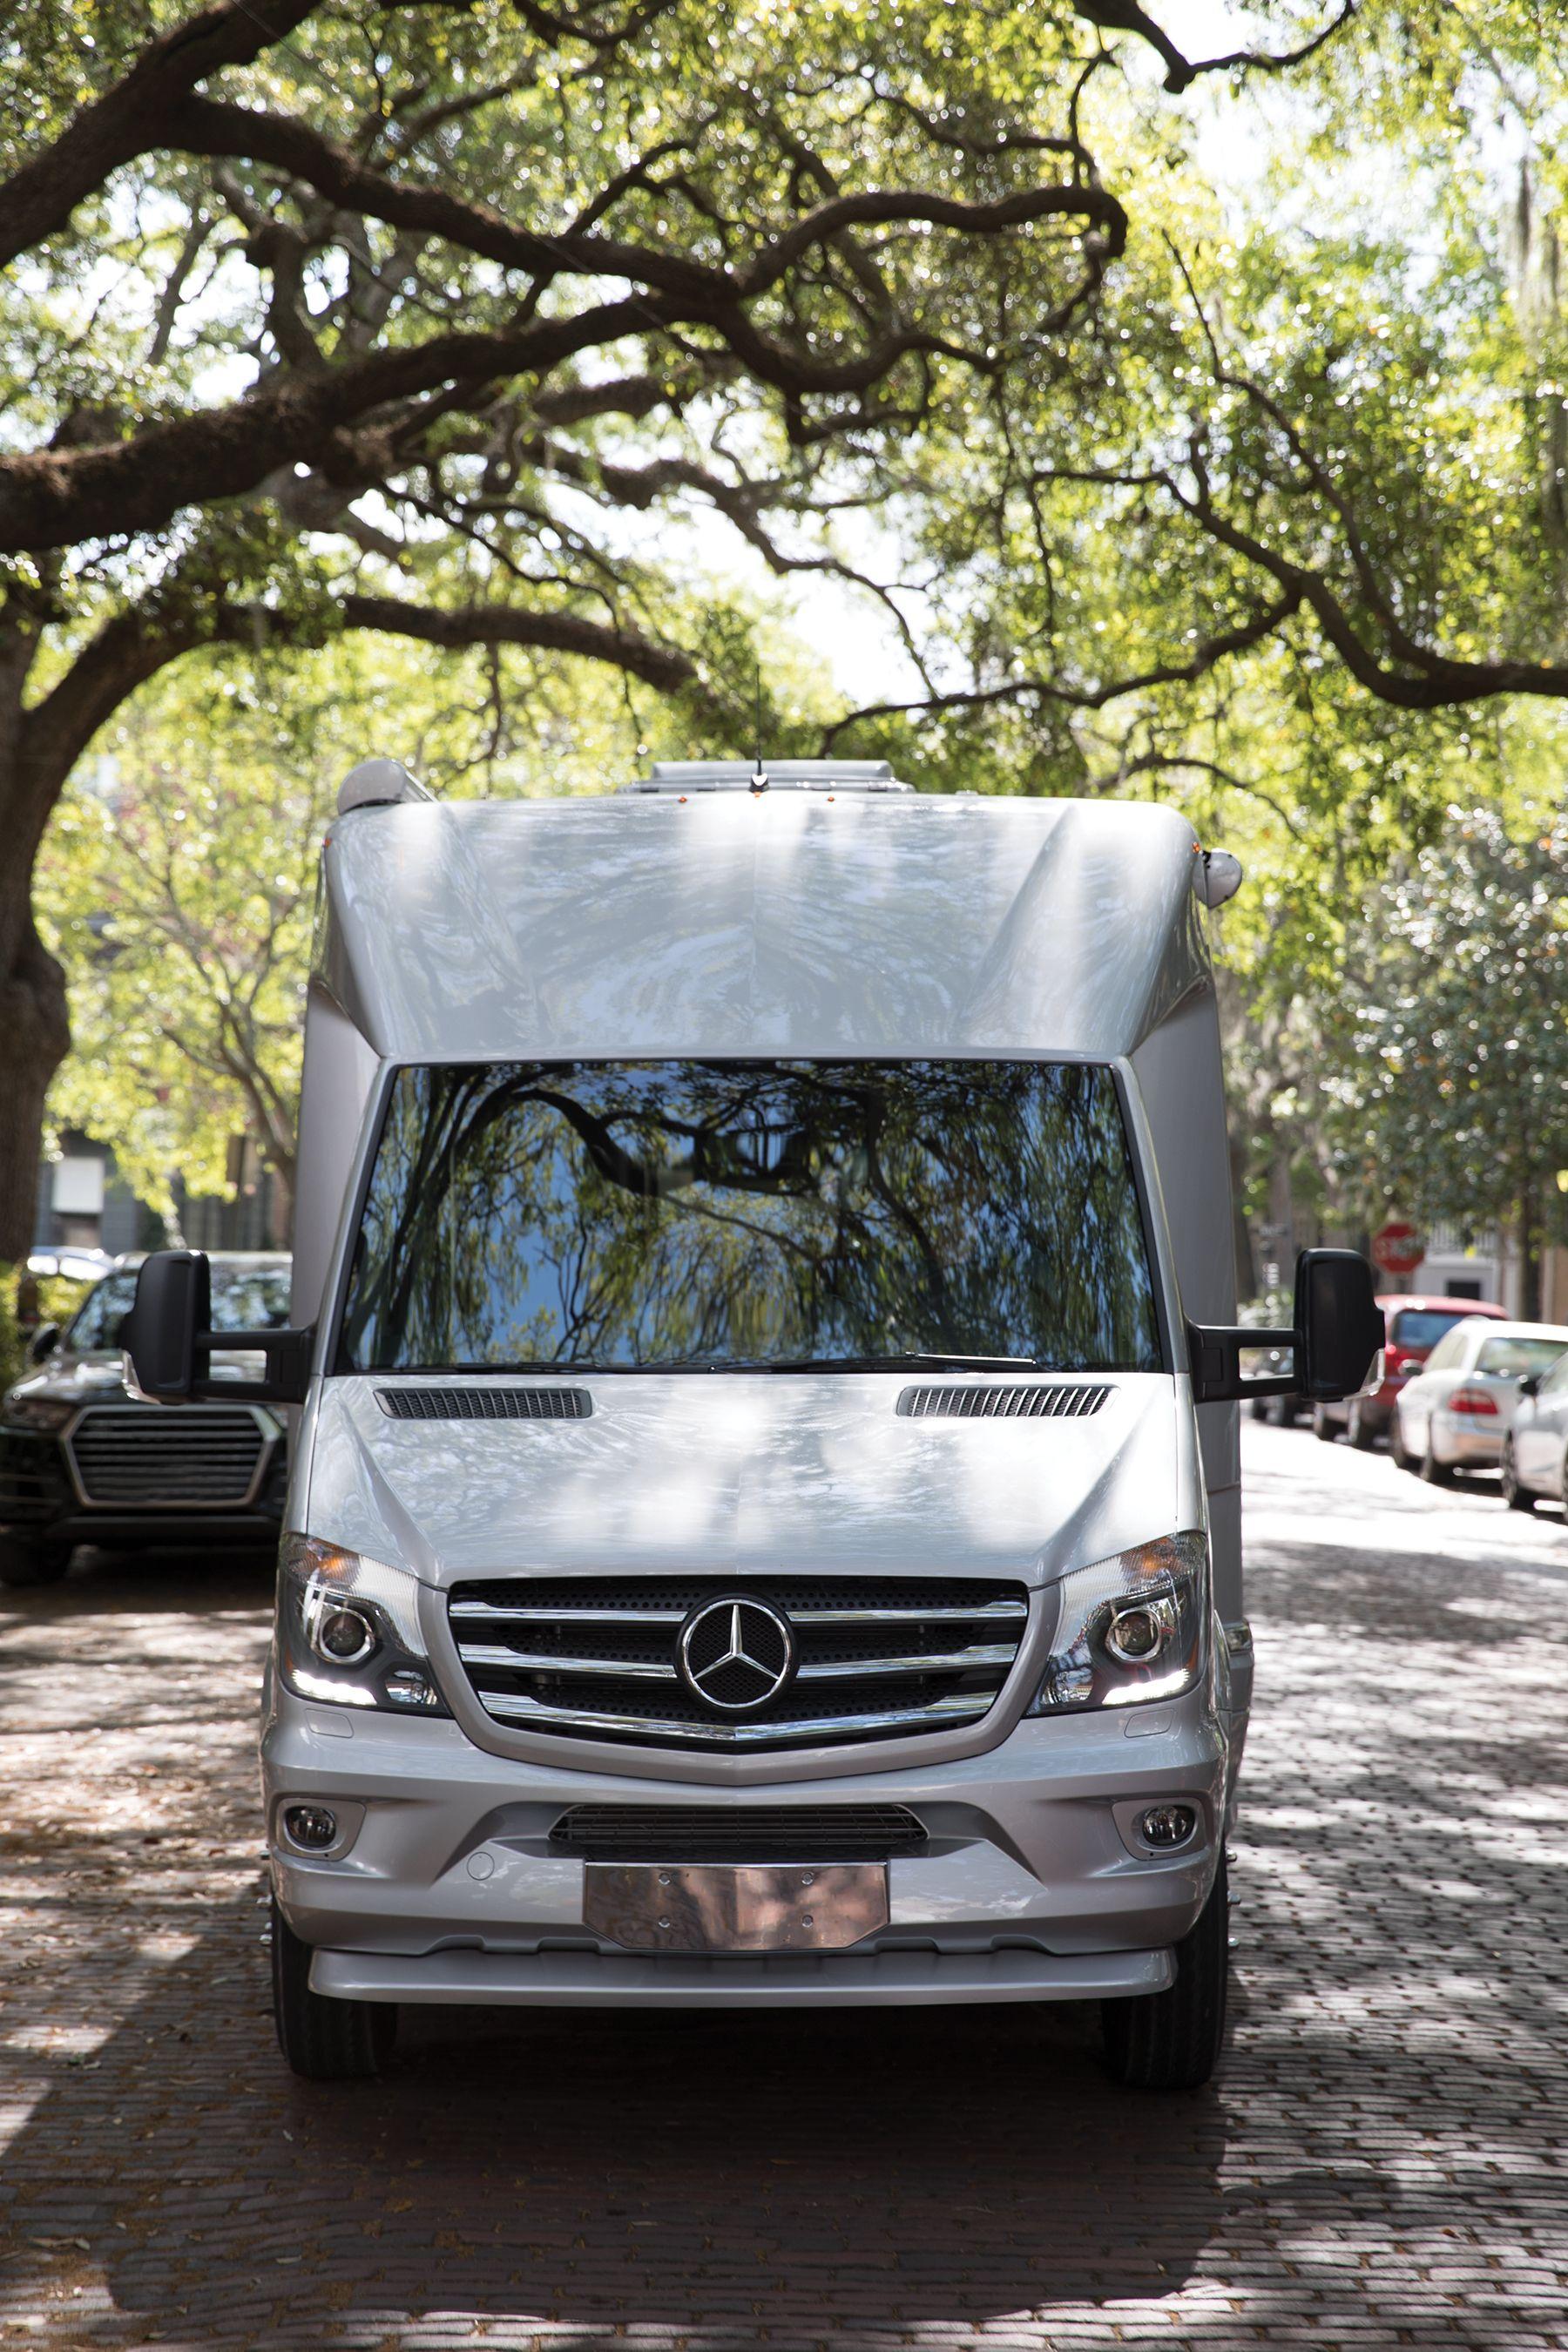 2020 airstream atlas touring luxury rv mercedes benz